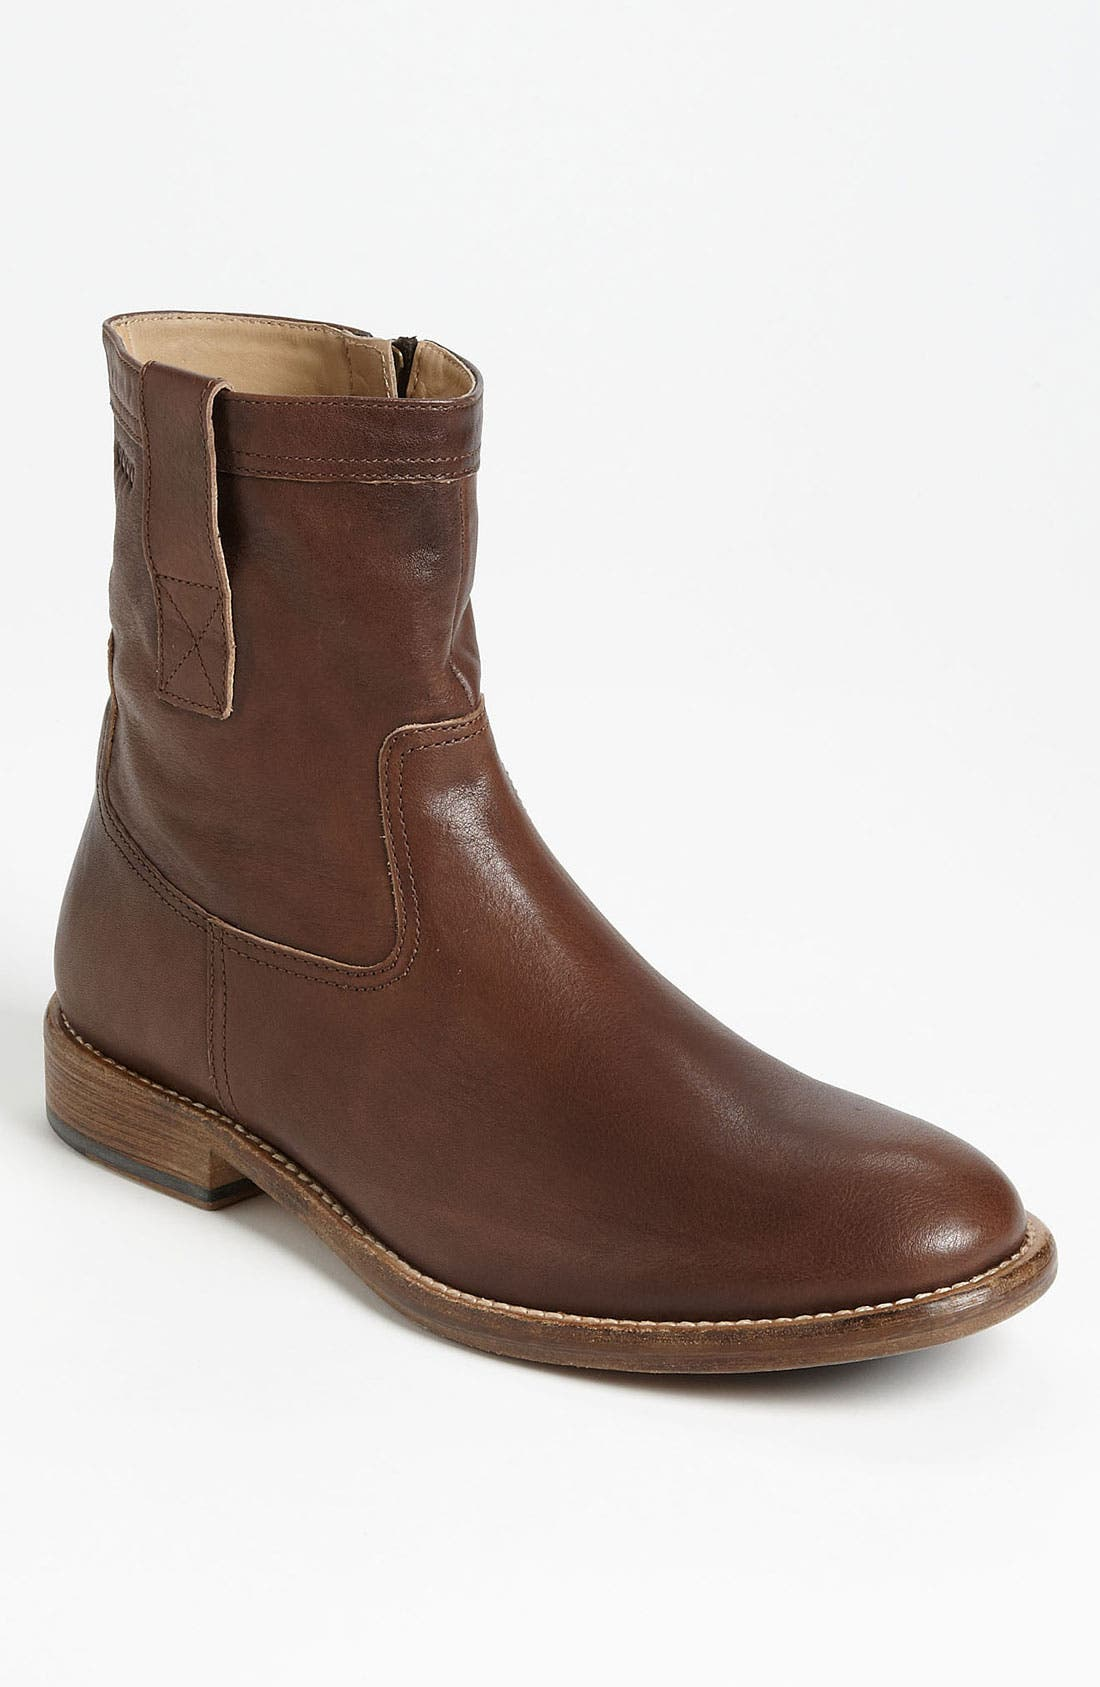 Main Image - ECCO 'Portisco' Boot